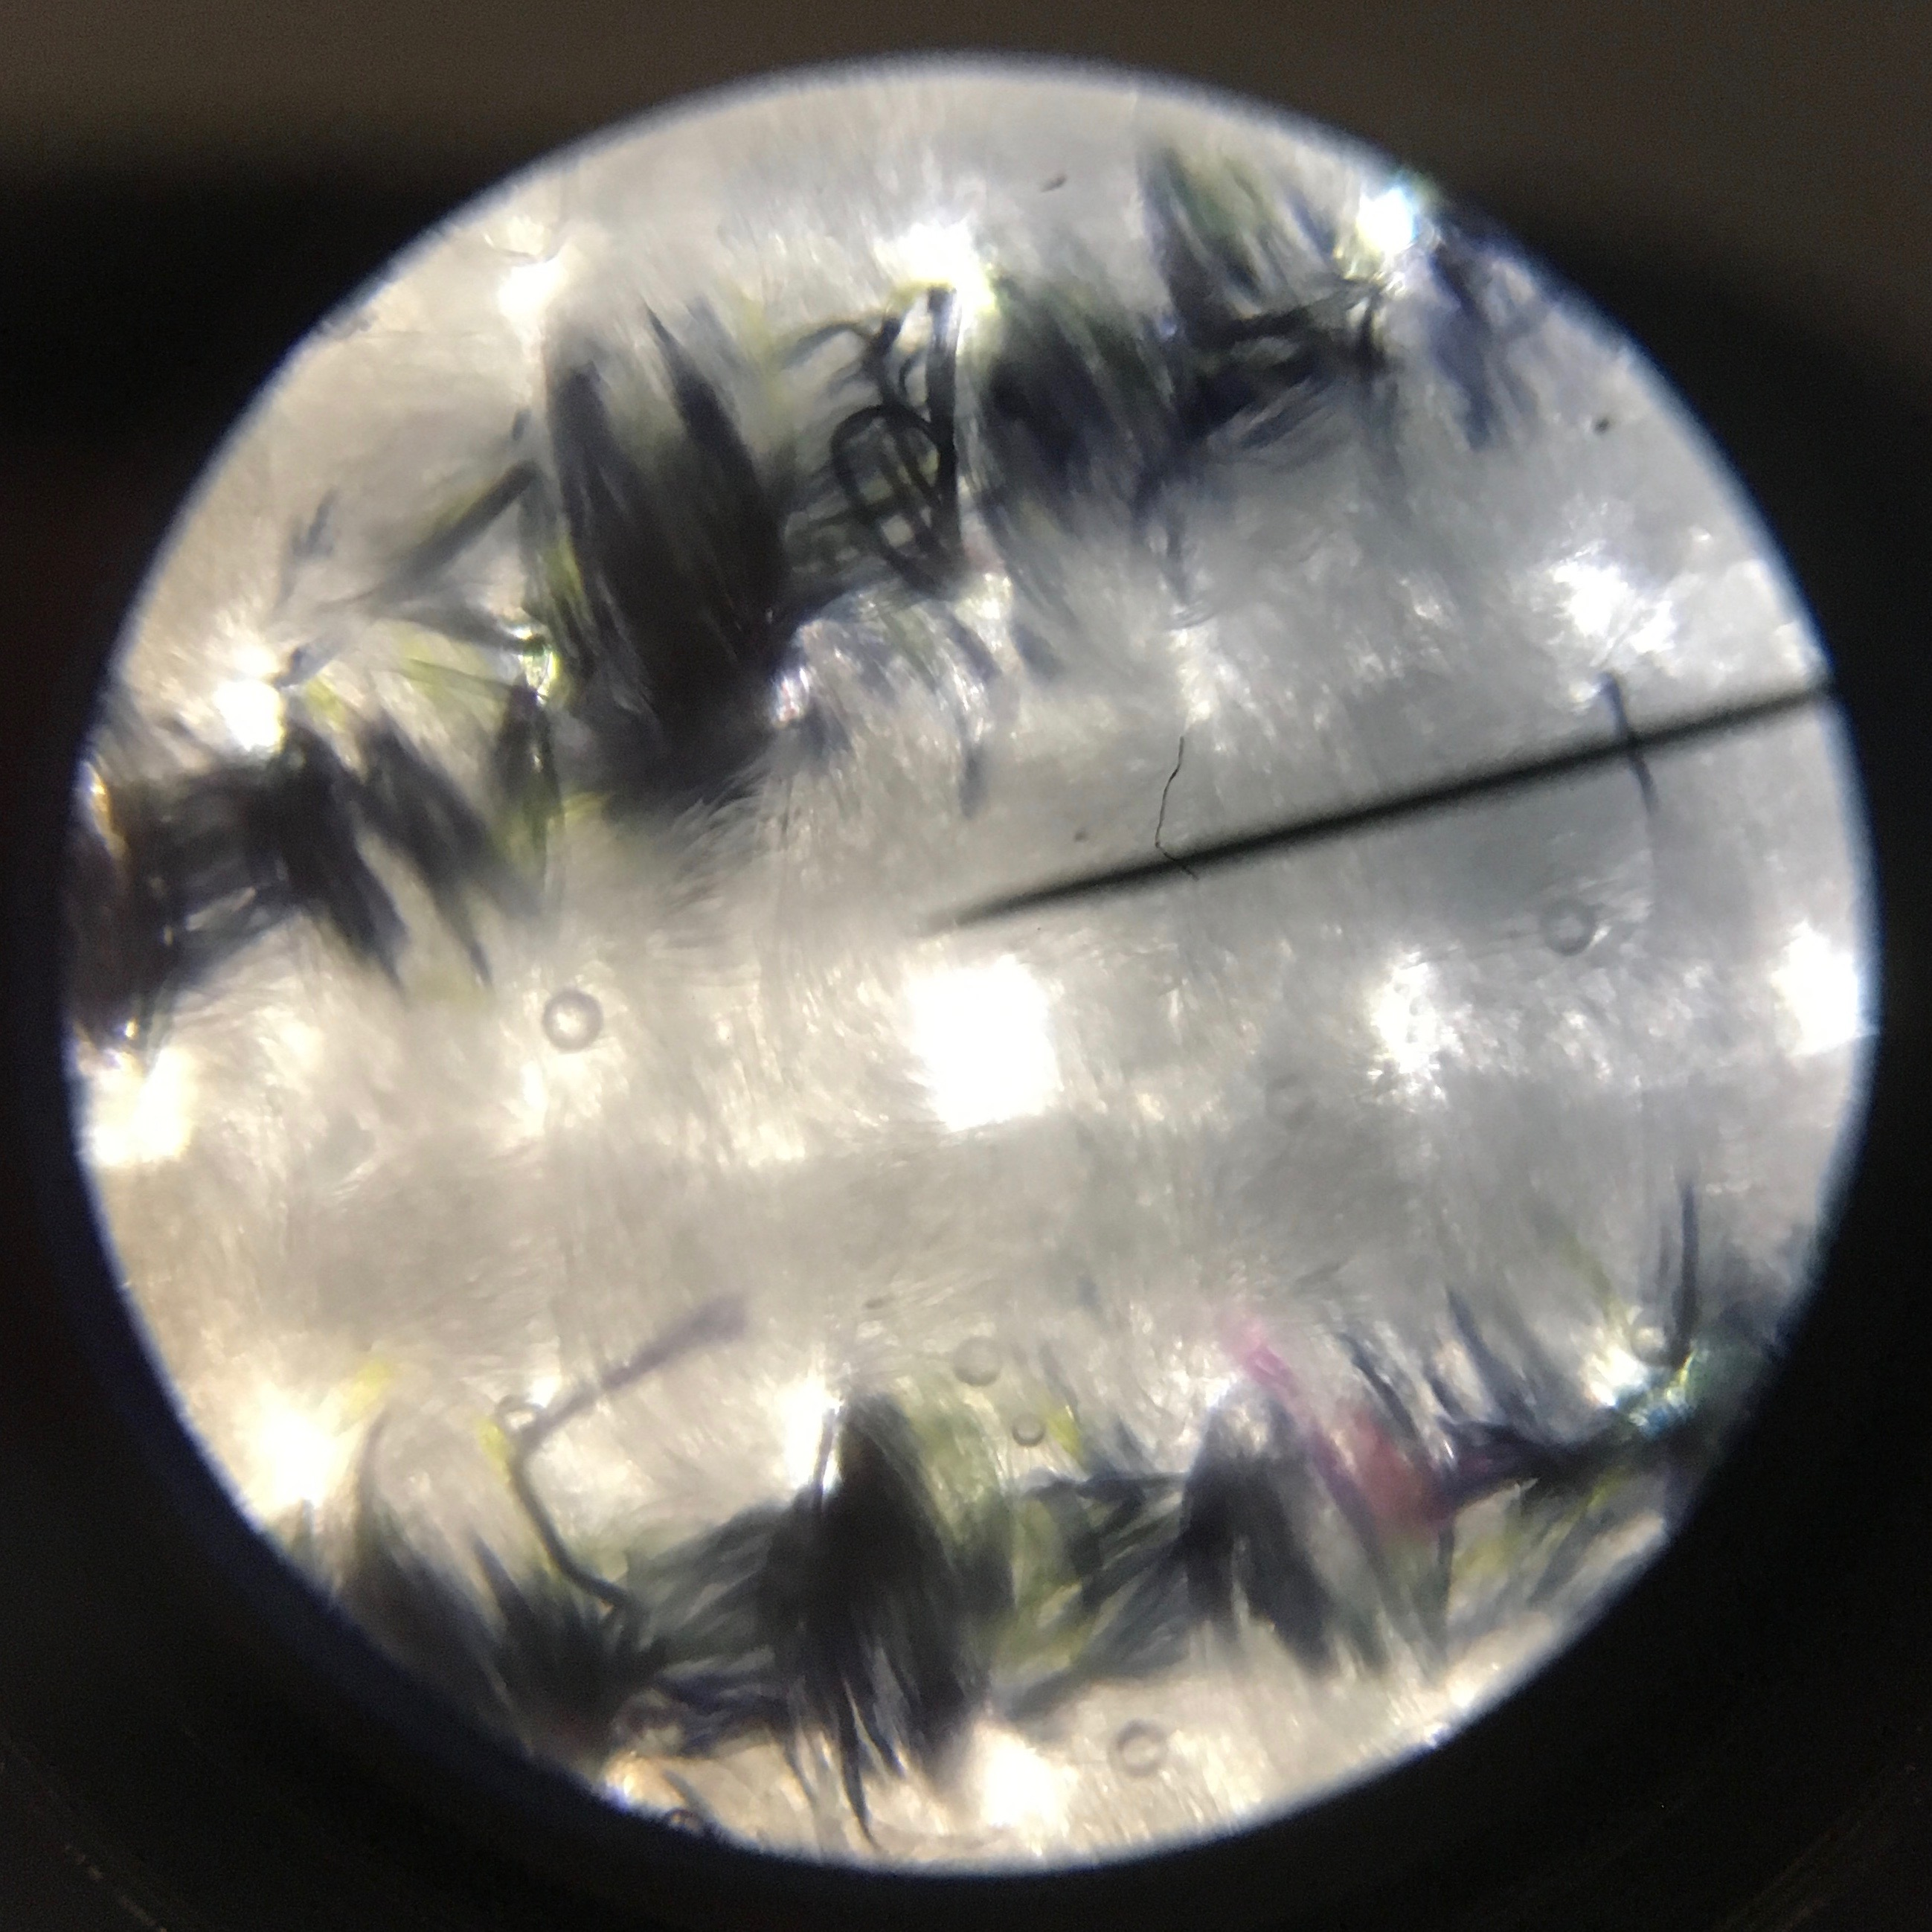 Microscope image of Nuppu print company cotton.